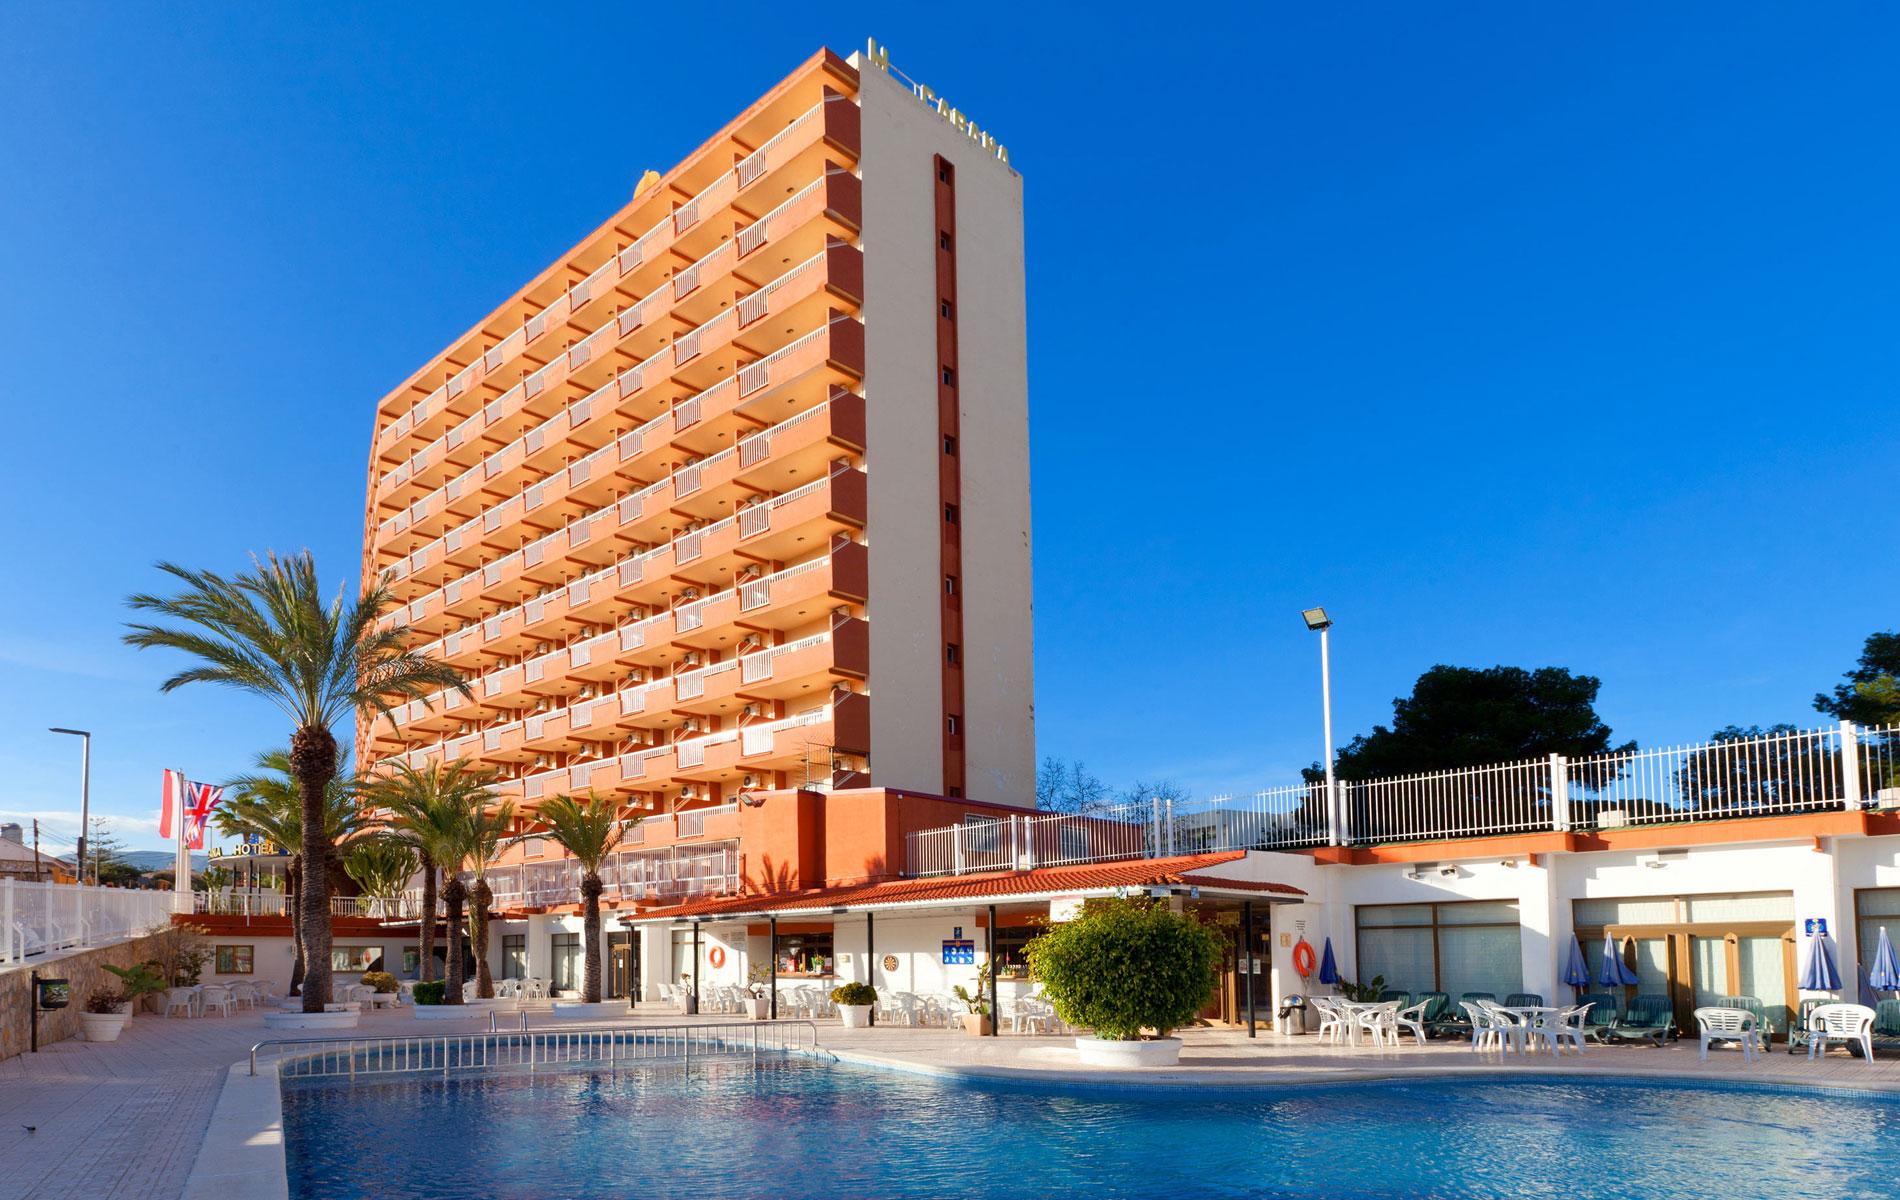 http://budavartours.hu/binaries/content/gallery/budavar/locations/accomodations/Spanyolorsz%C3%A1g/Benidorm/Cabana+Hotel/cabanahotel.jpg